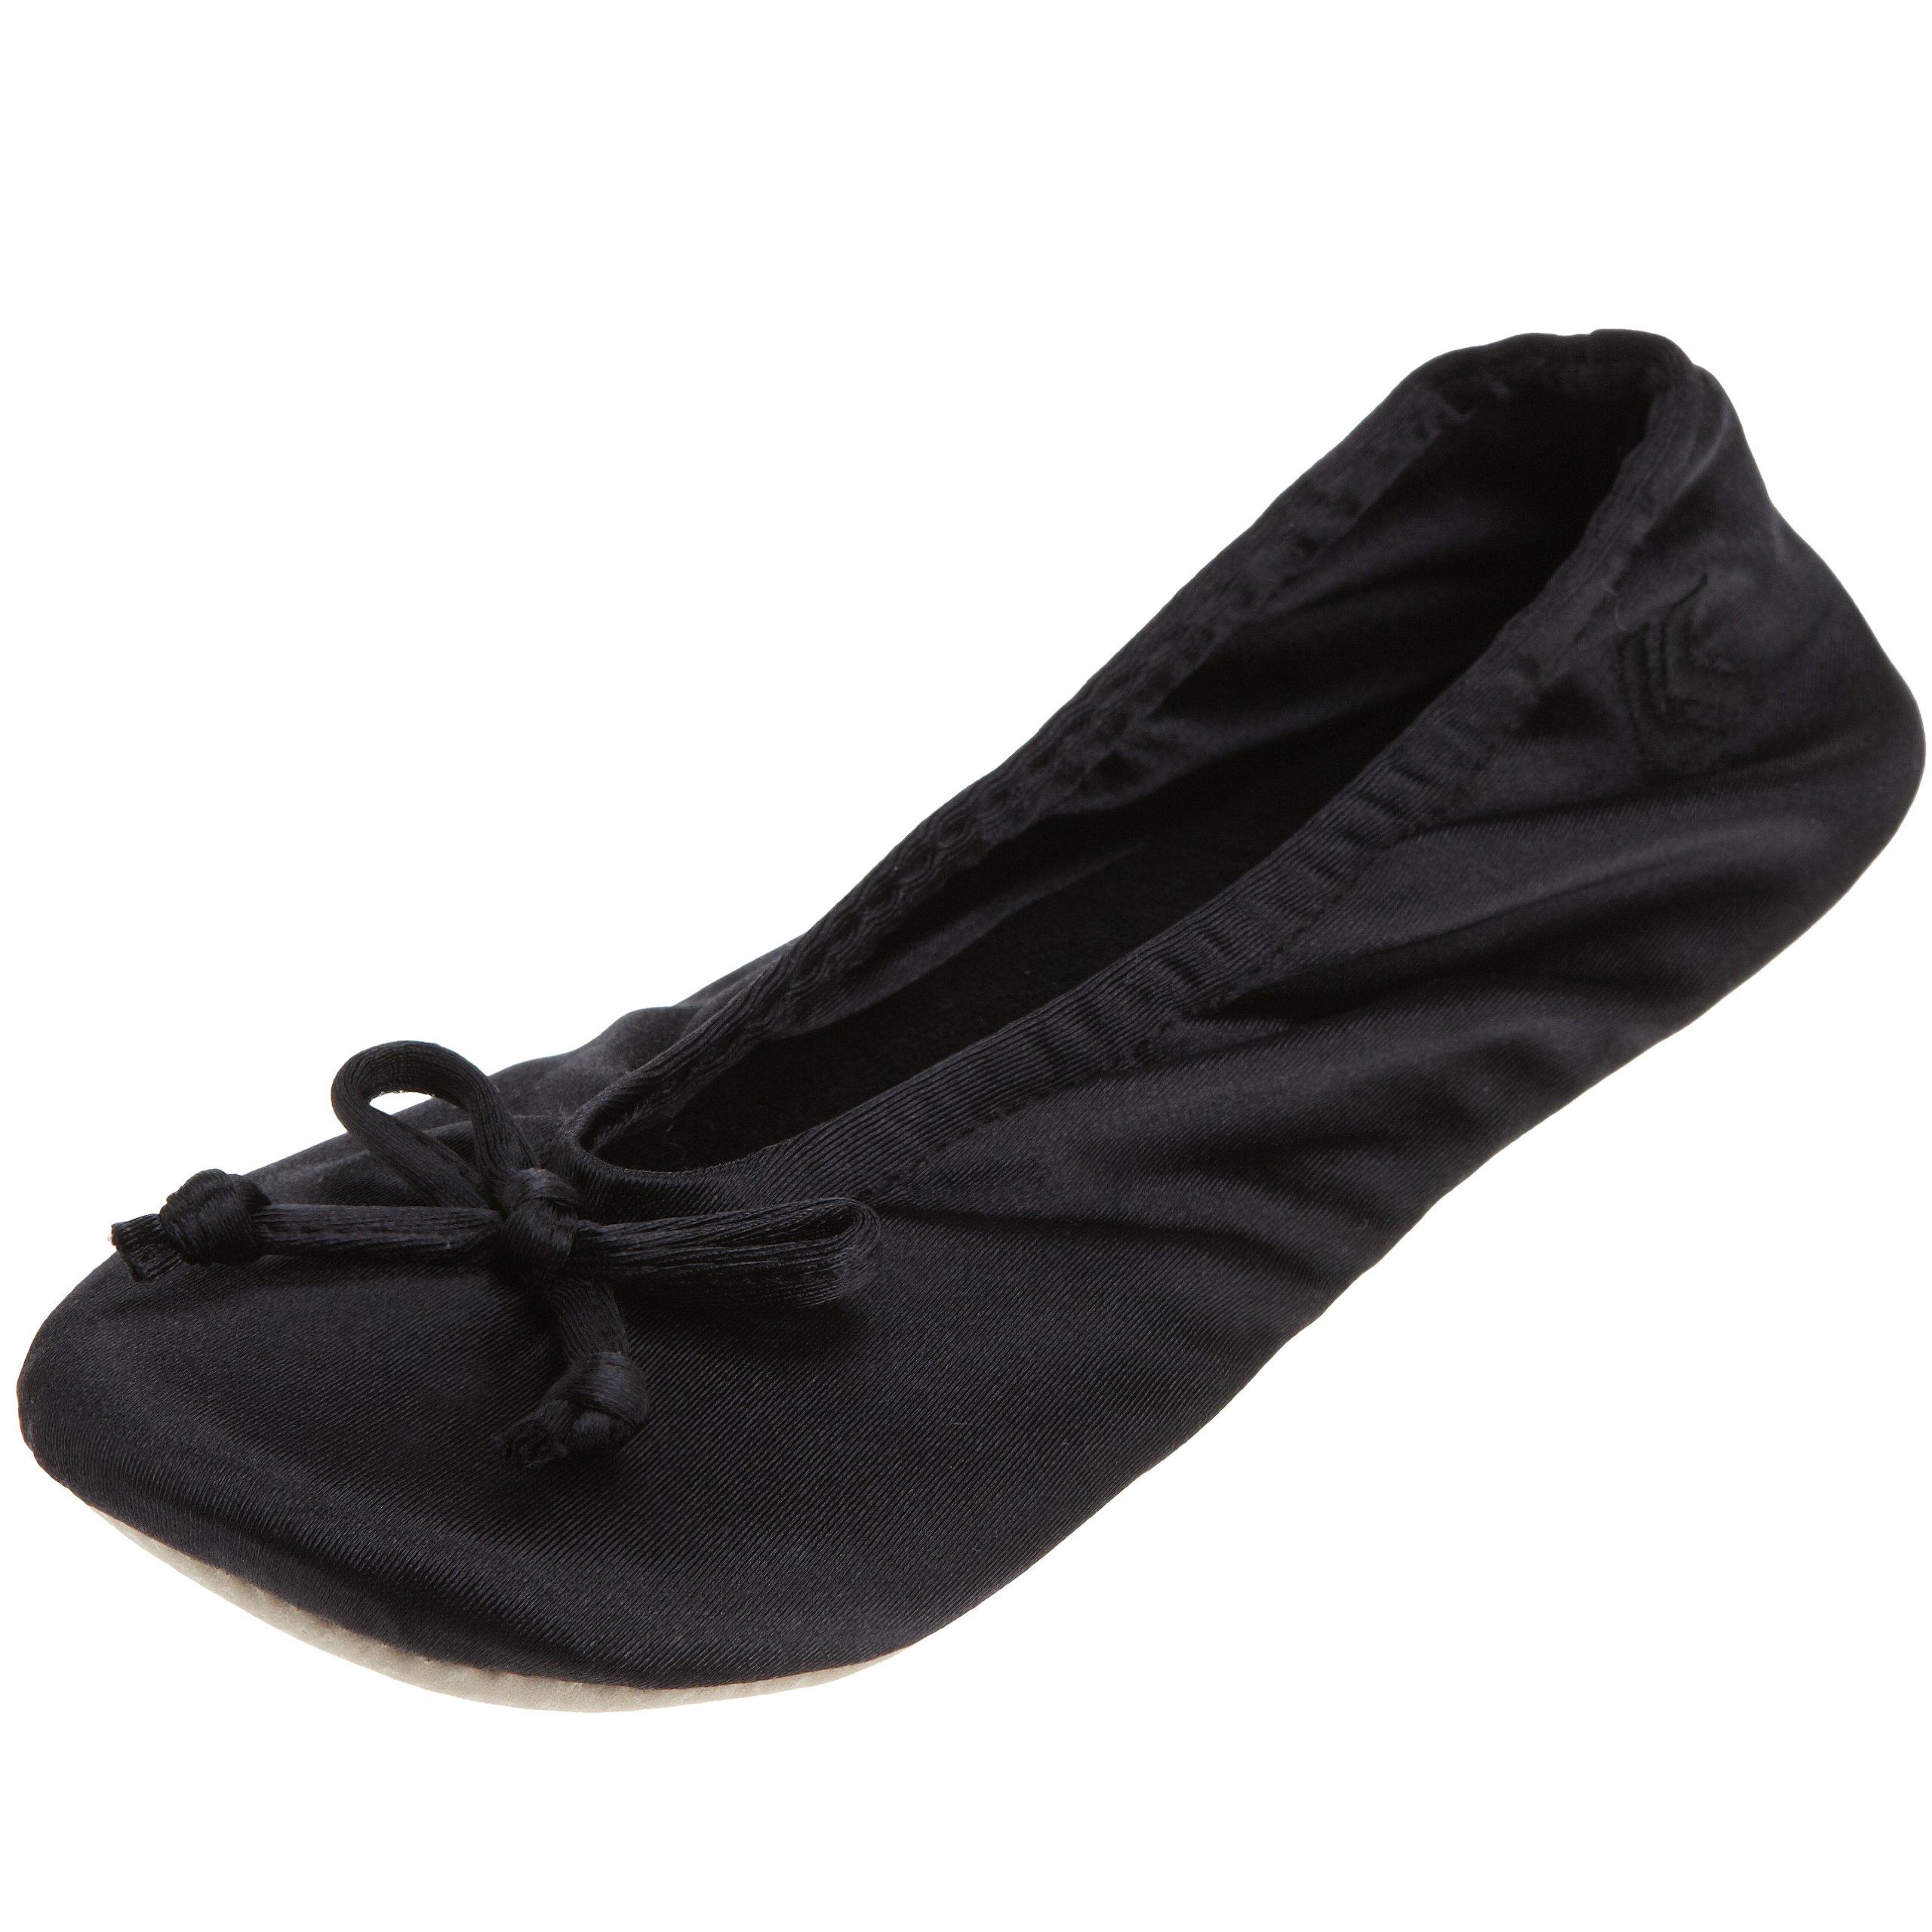 ISOTONER Women's Classic Satin Ballerina Slipper, XL Black